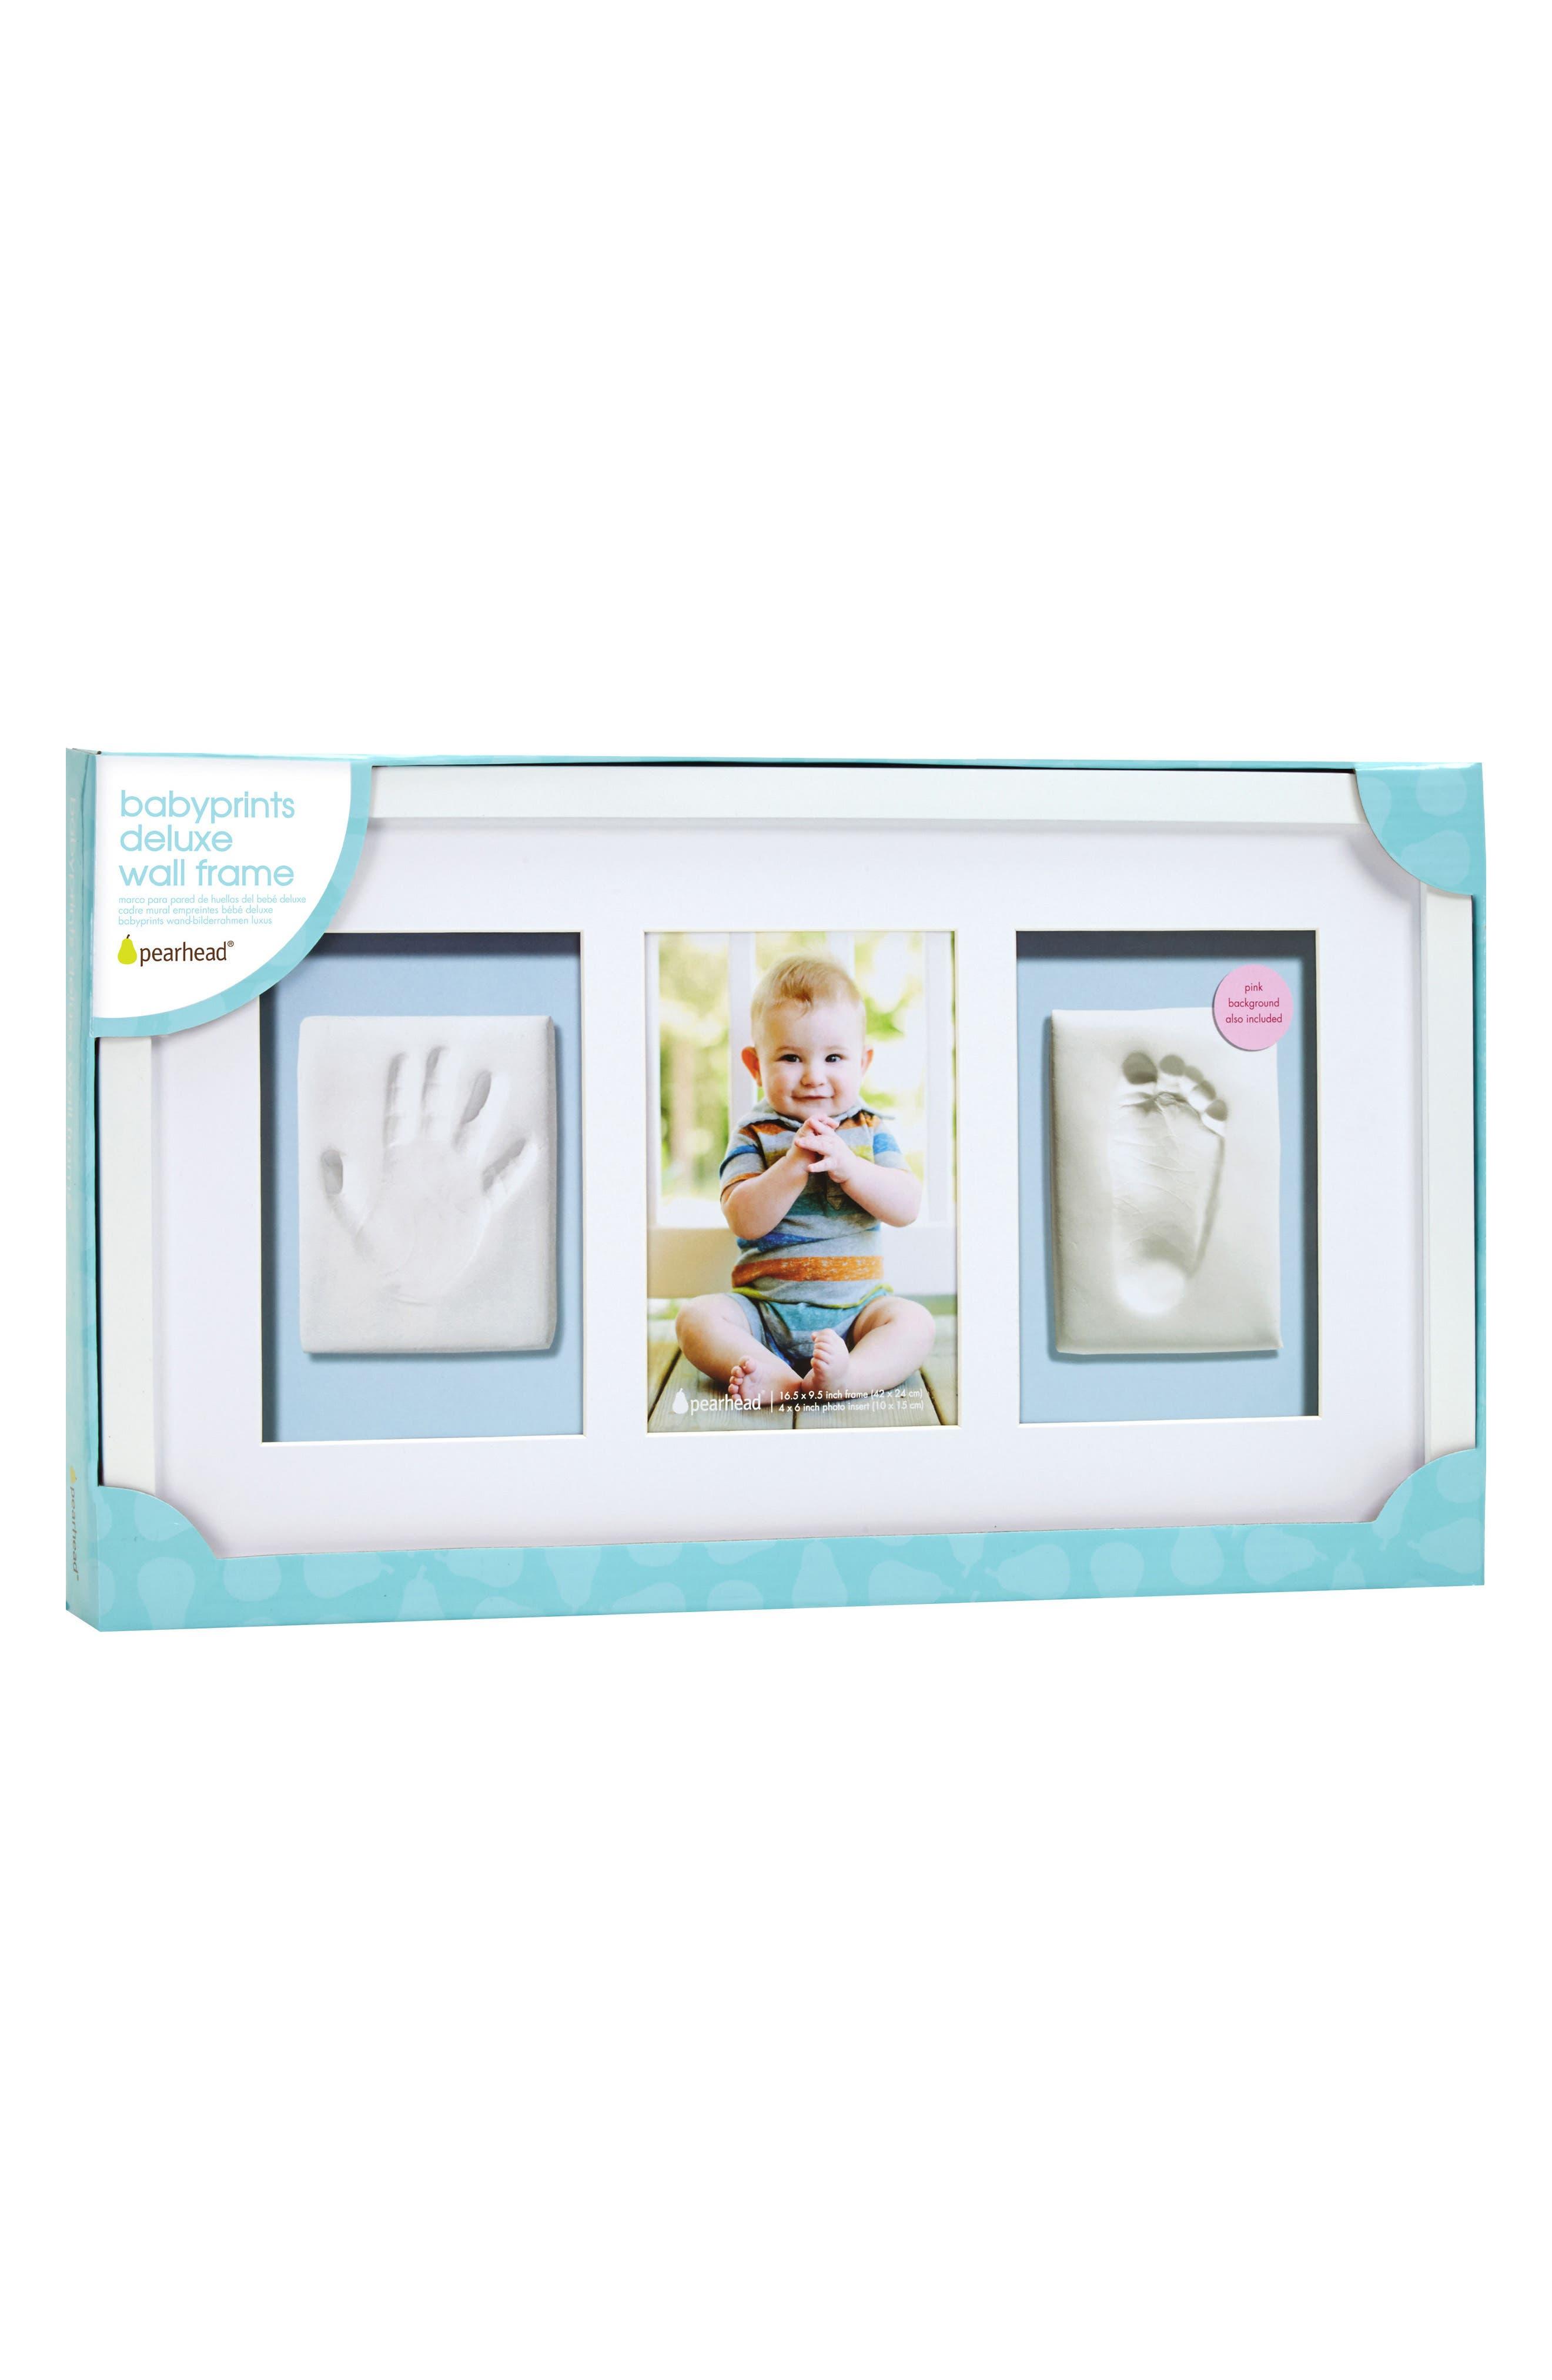 Babyprints Deluxe Wall Frame Kit,                             Main thumbnail 1, color,                             White